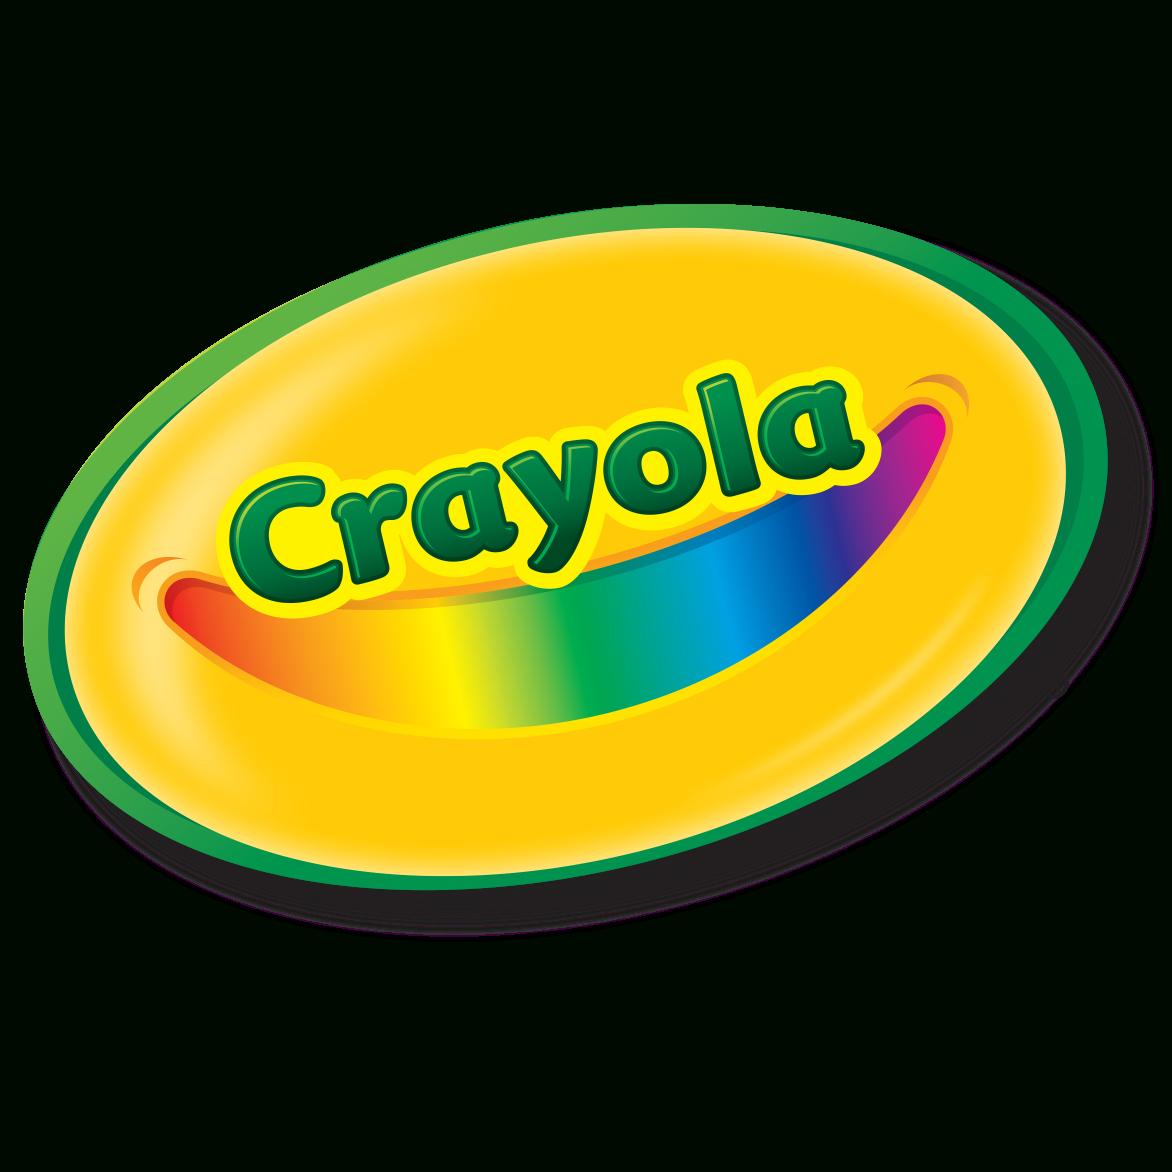 Crayola Emoji Maker Review: | Blog Submissions | Crayon Box, Crayola - Free Printable Crayola Coupons